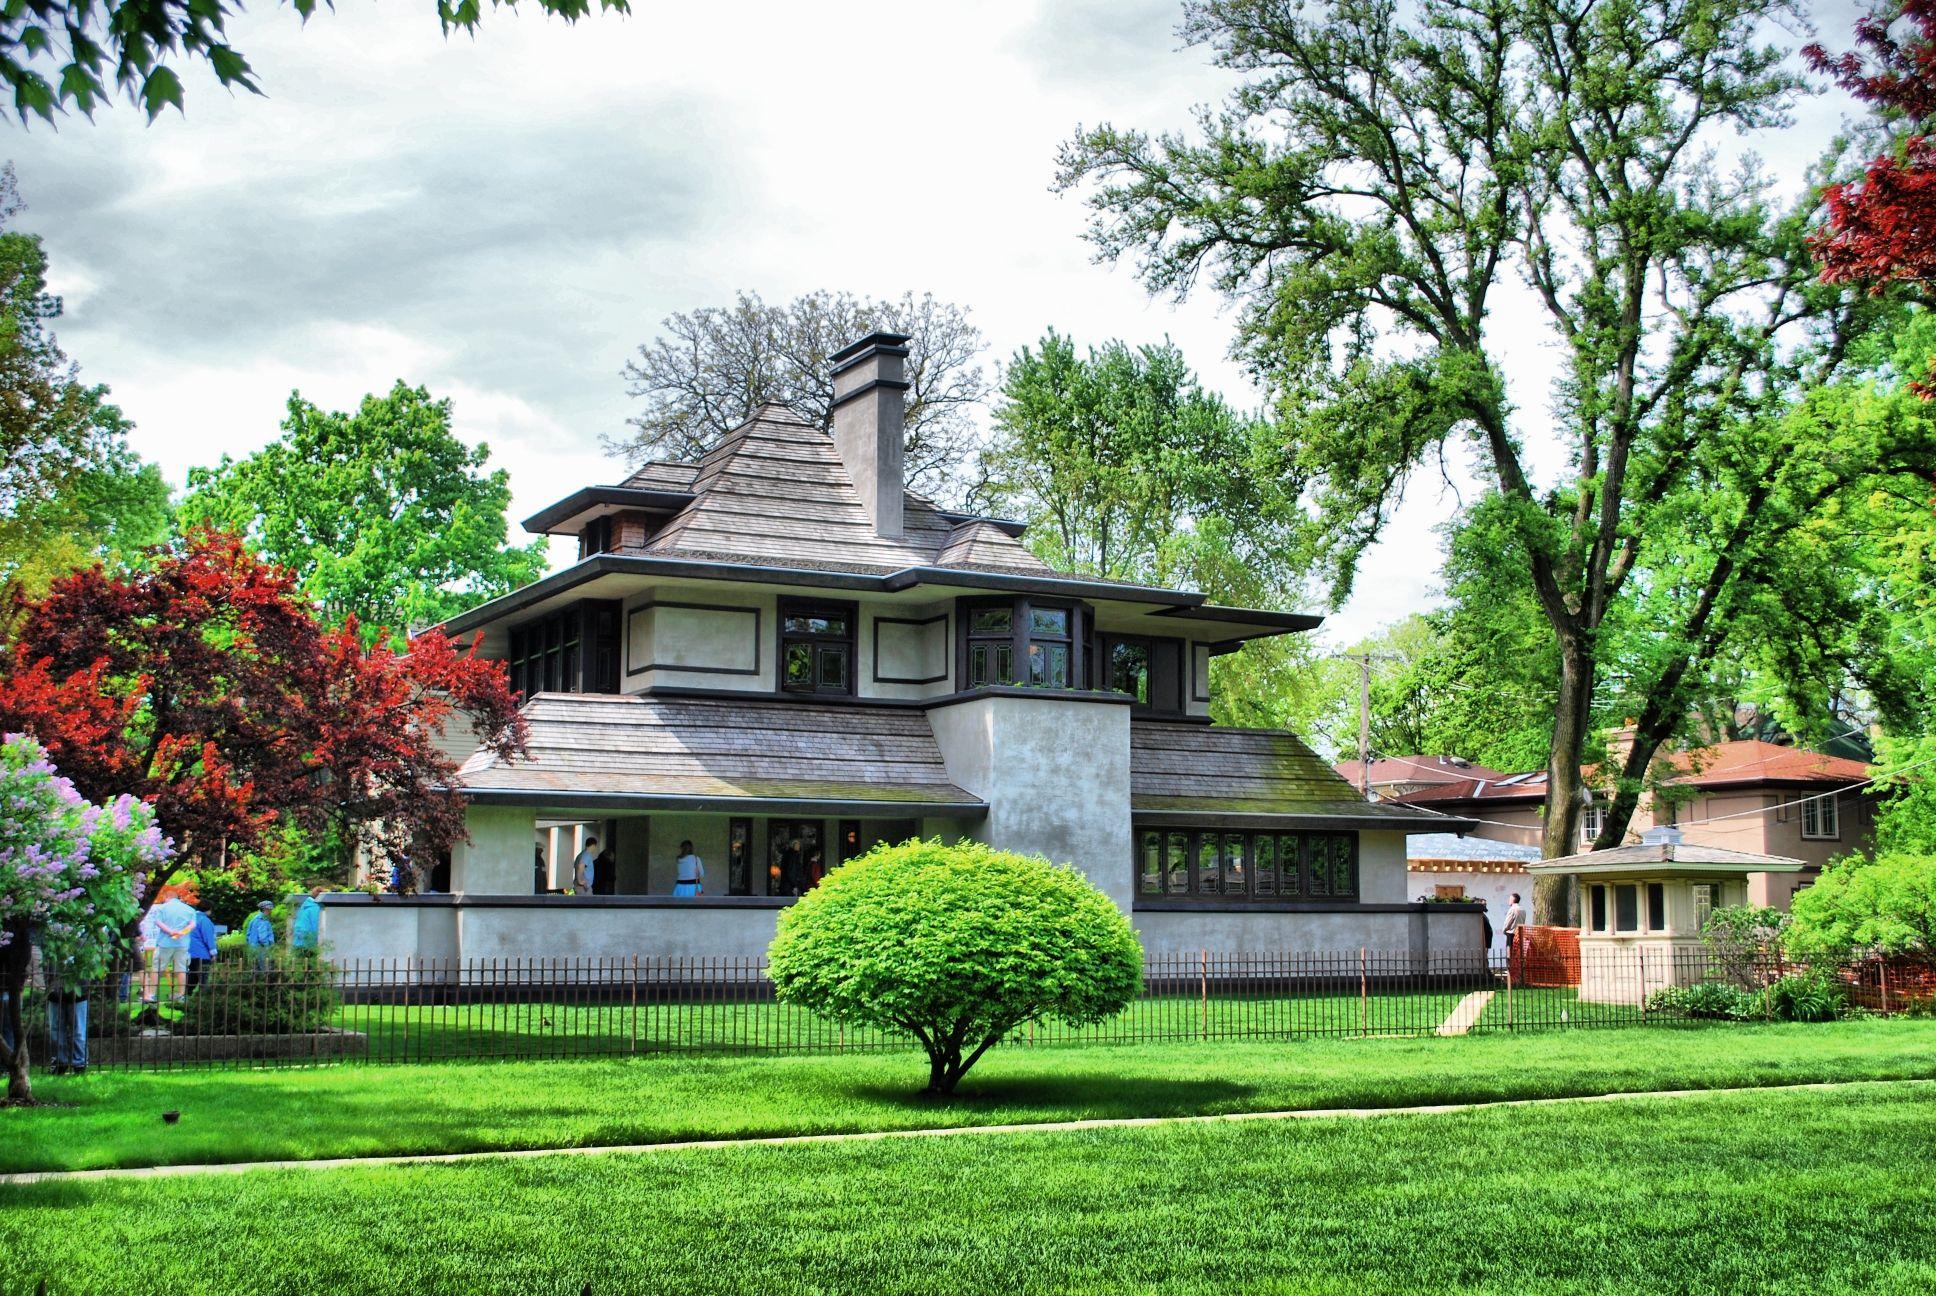 The Hills-DeCaro House